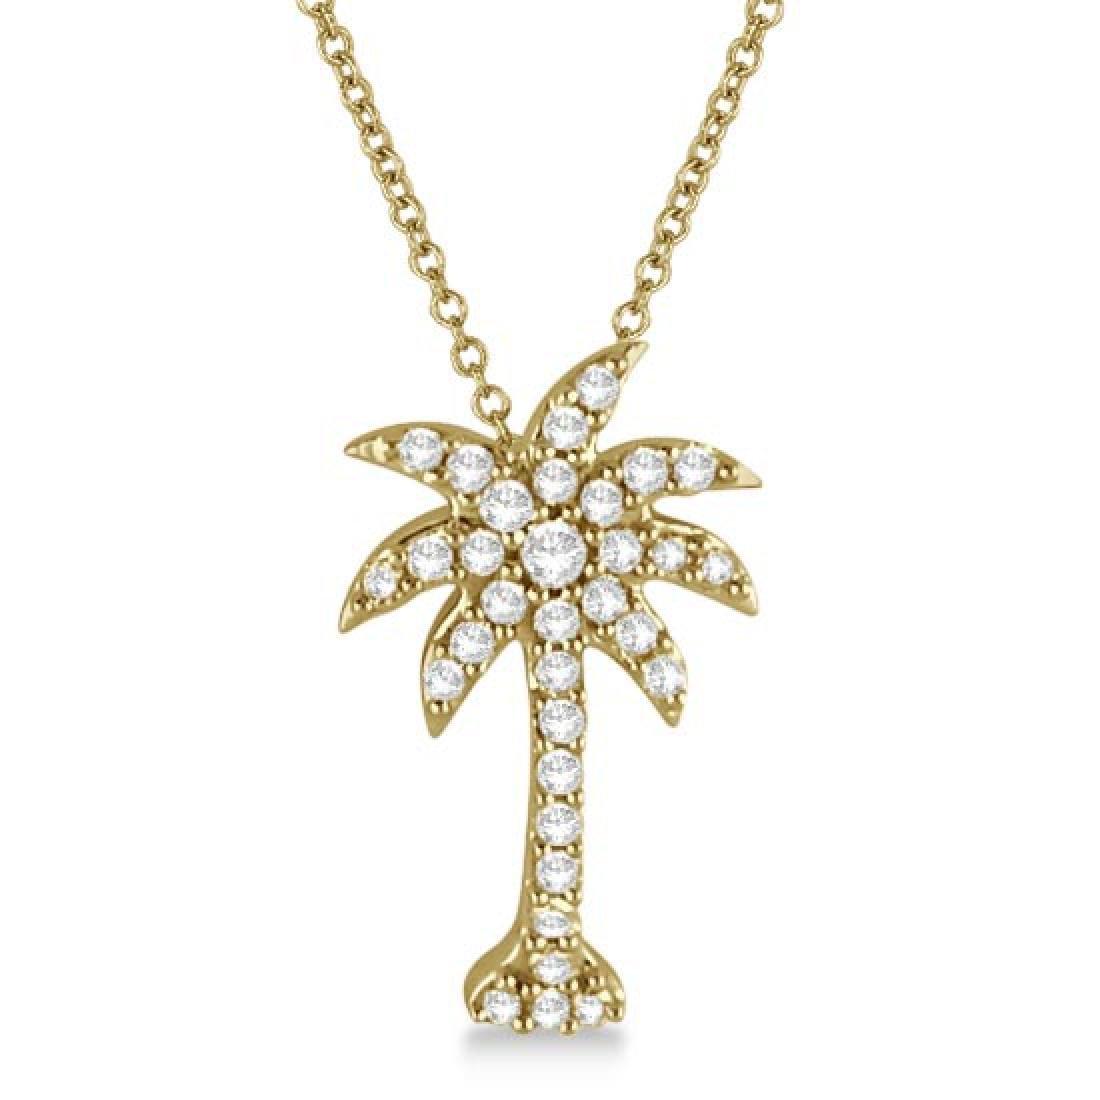 Palm Tree Shaped Diamond Pendant Necklace 14k Yellow Go